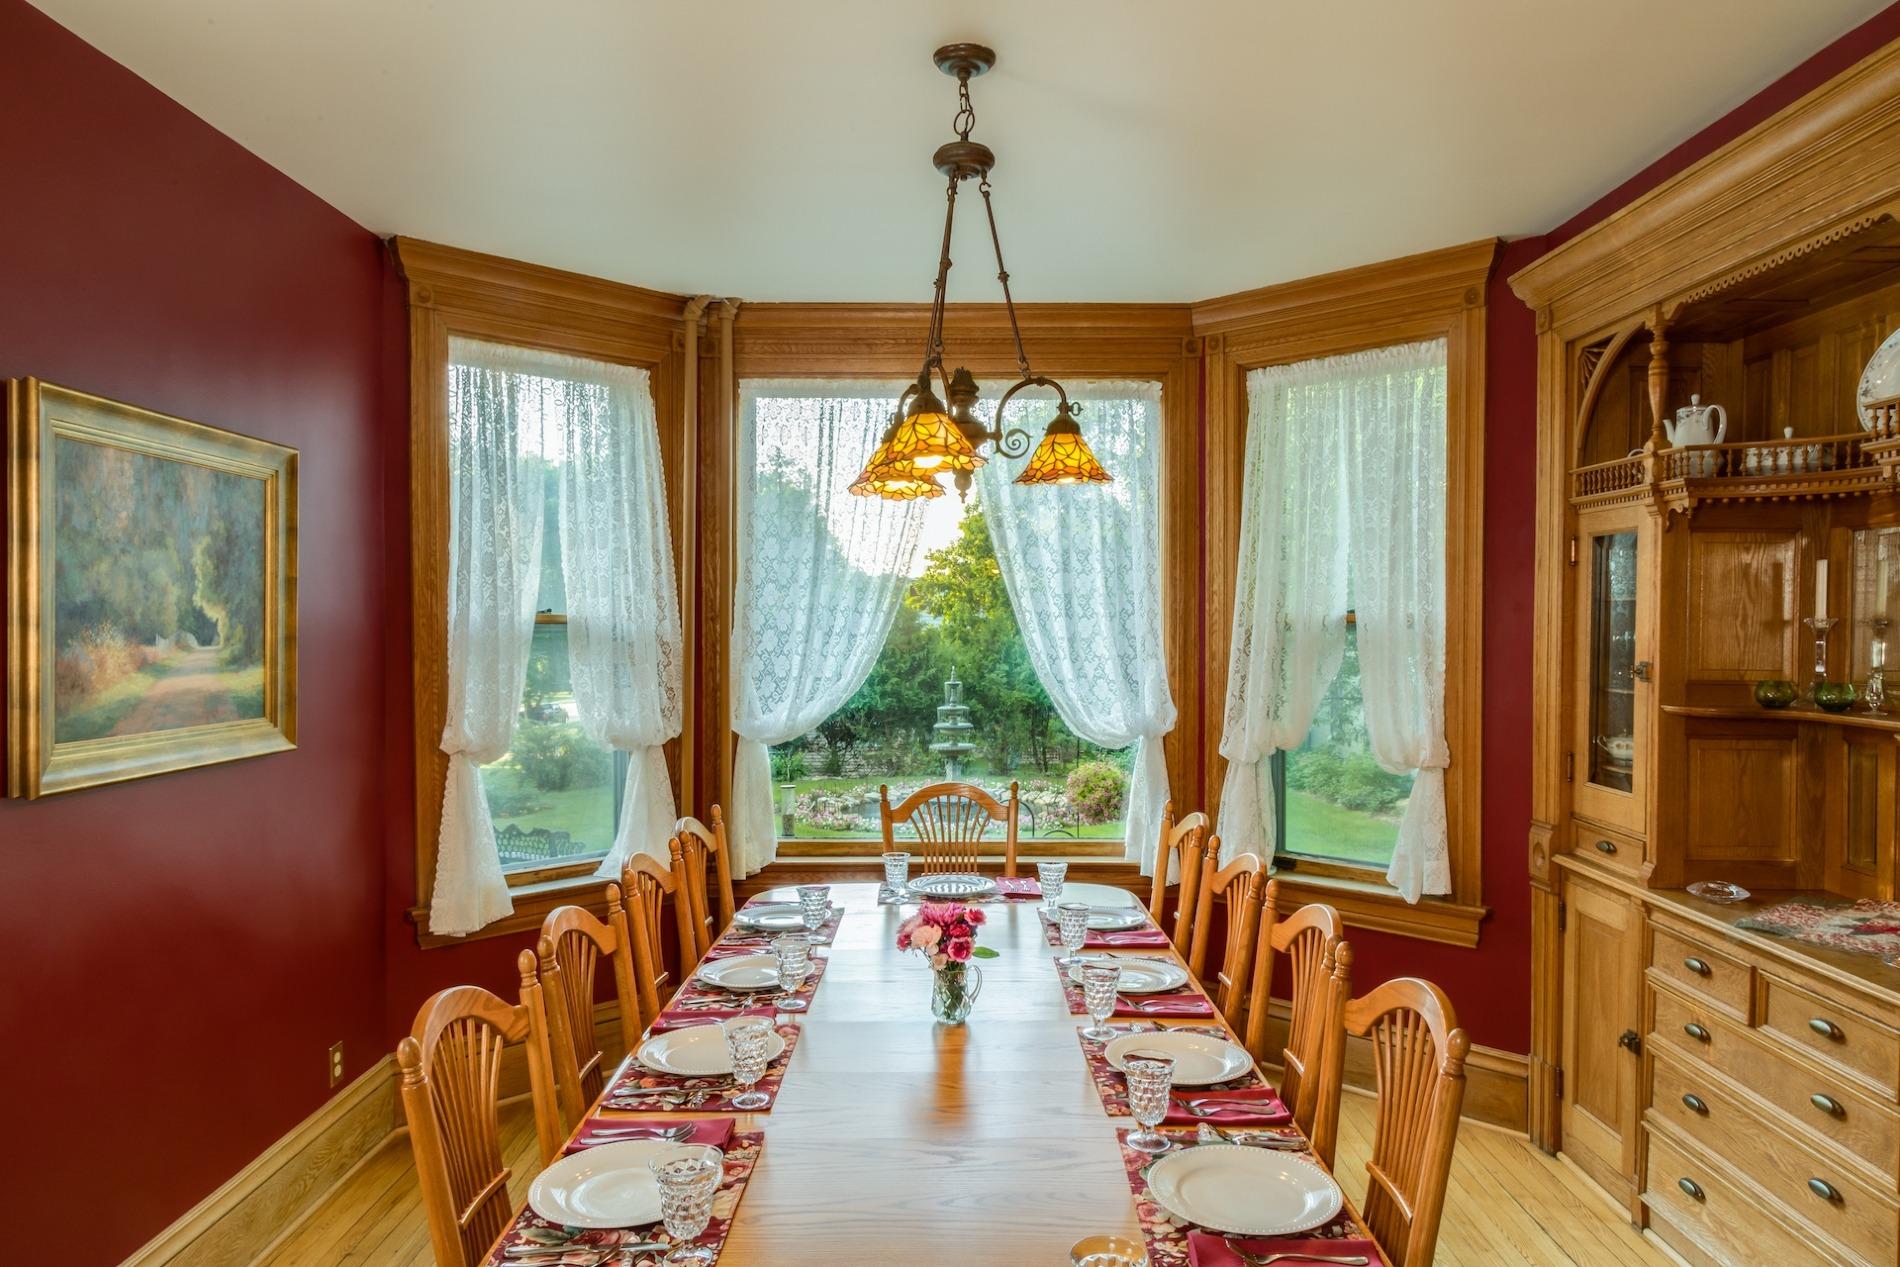 Habberstad-diningroom - Habberstad House Bed and Breakfast (1)